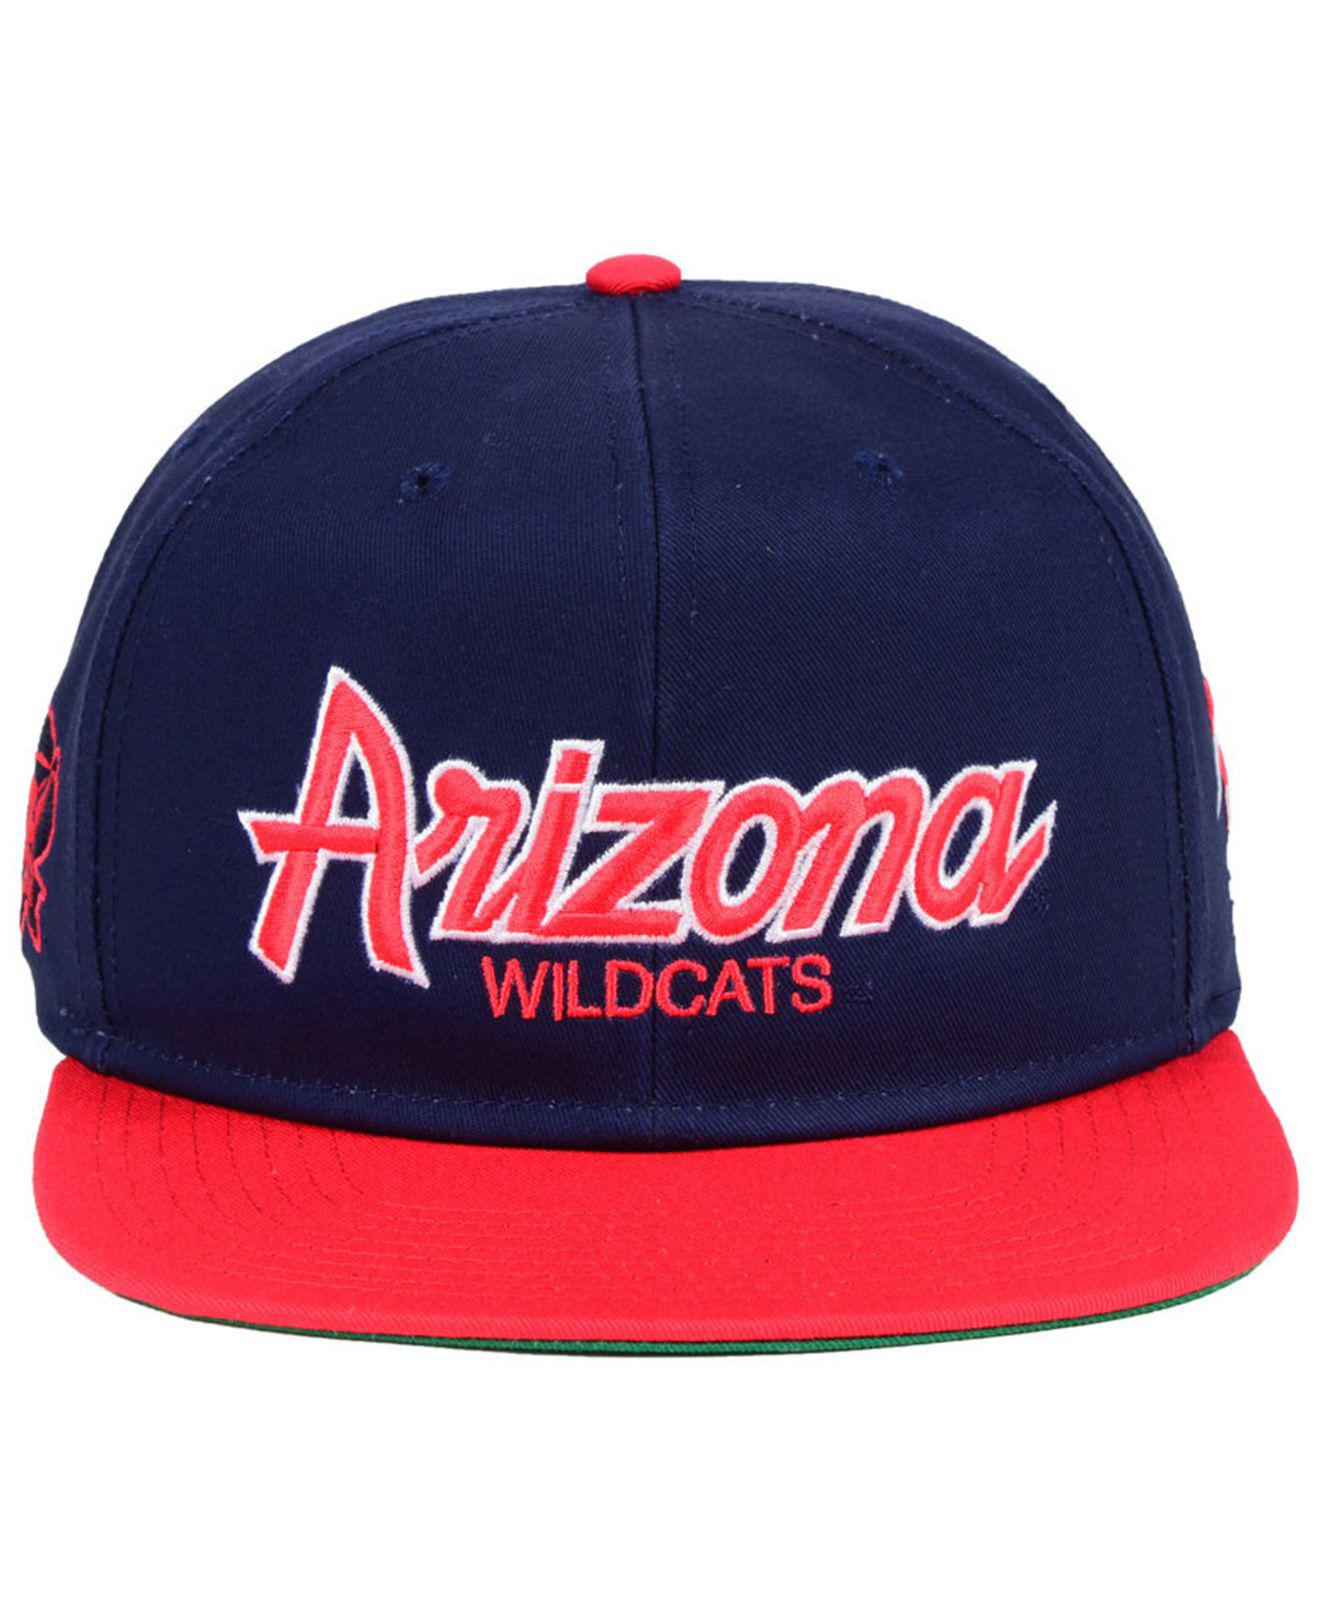 f8ff3078 ... promo code for lyst nike arizona wildcats sport specialties snapback  cap in blue for men aec02